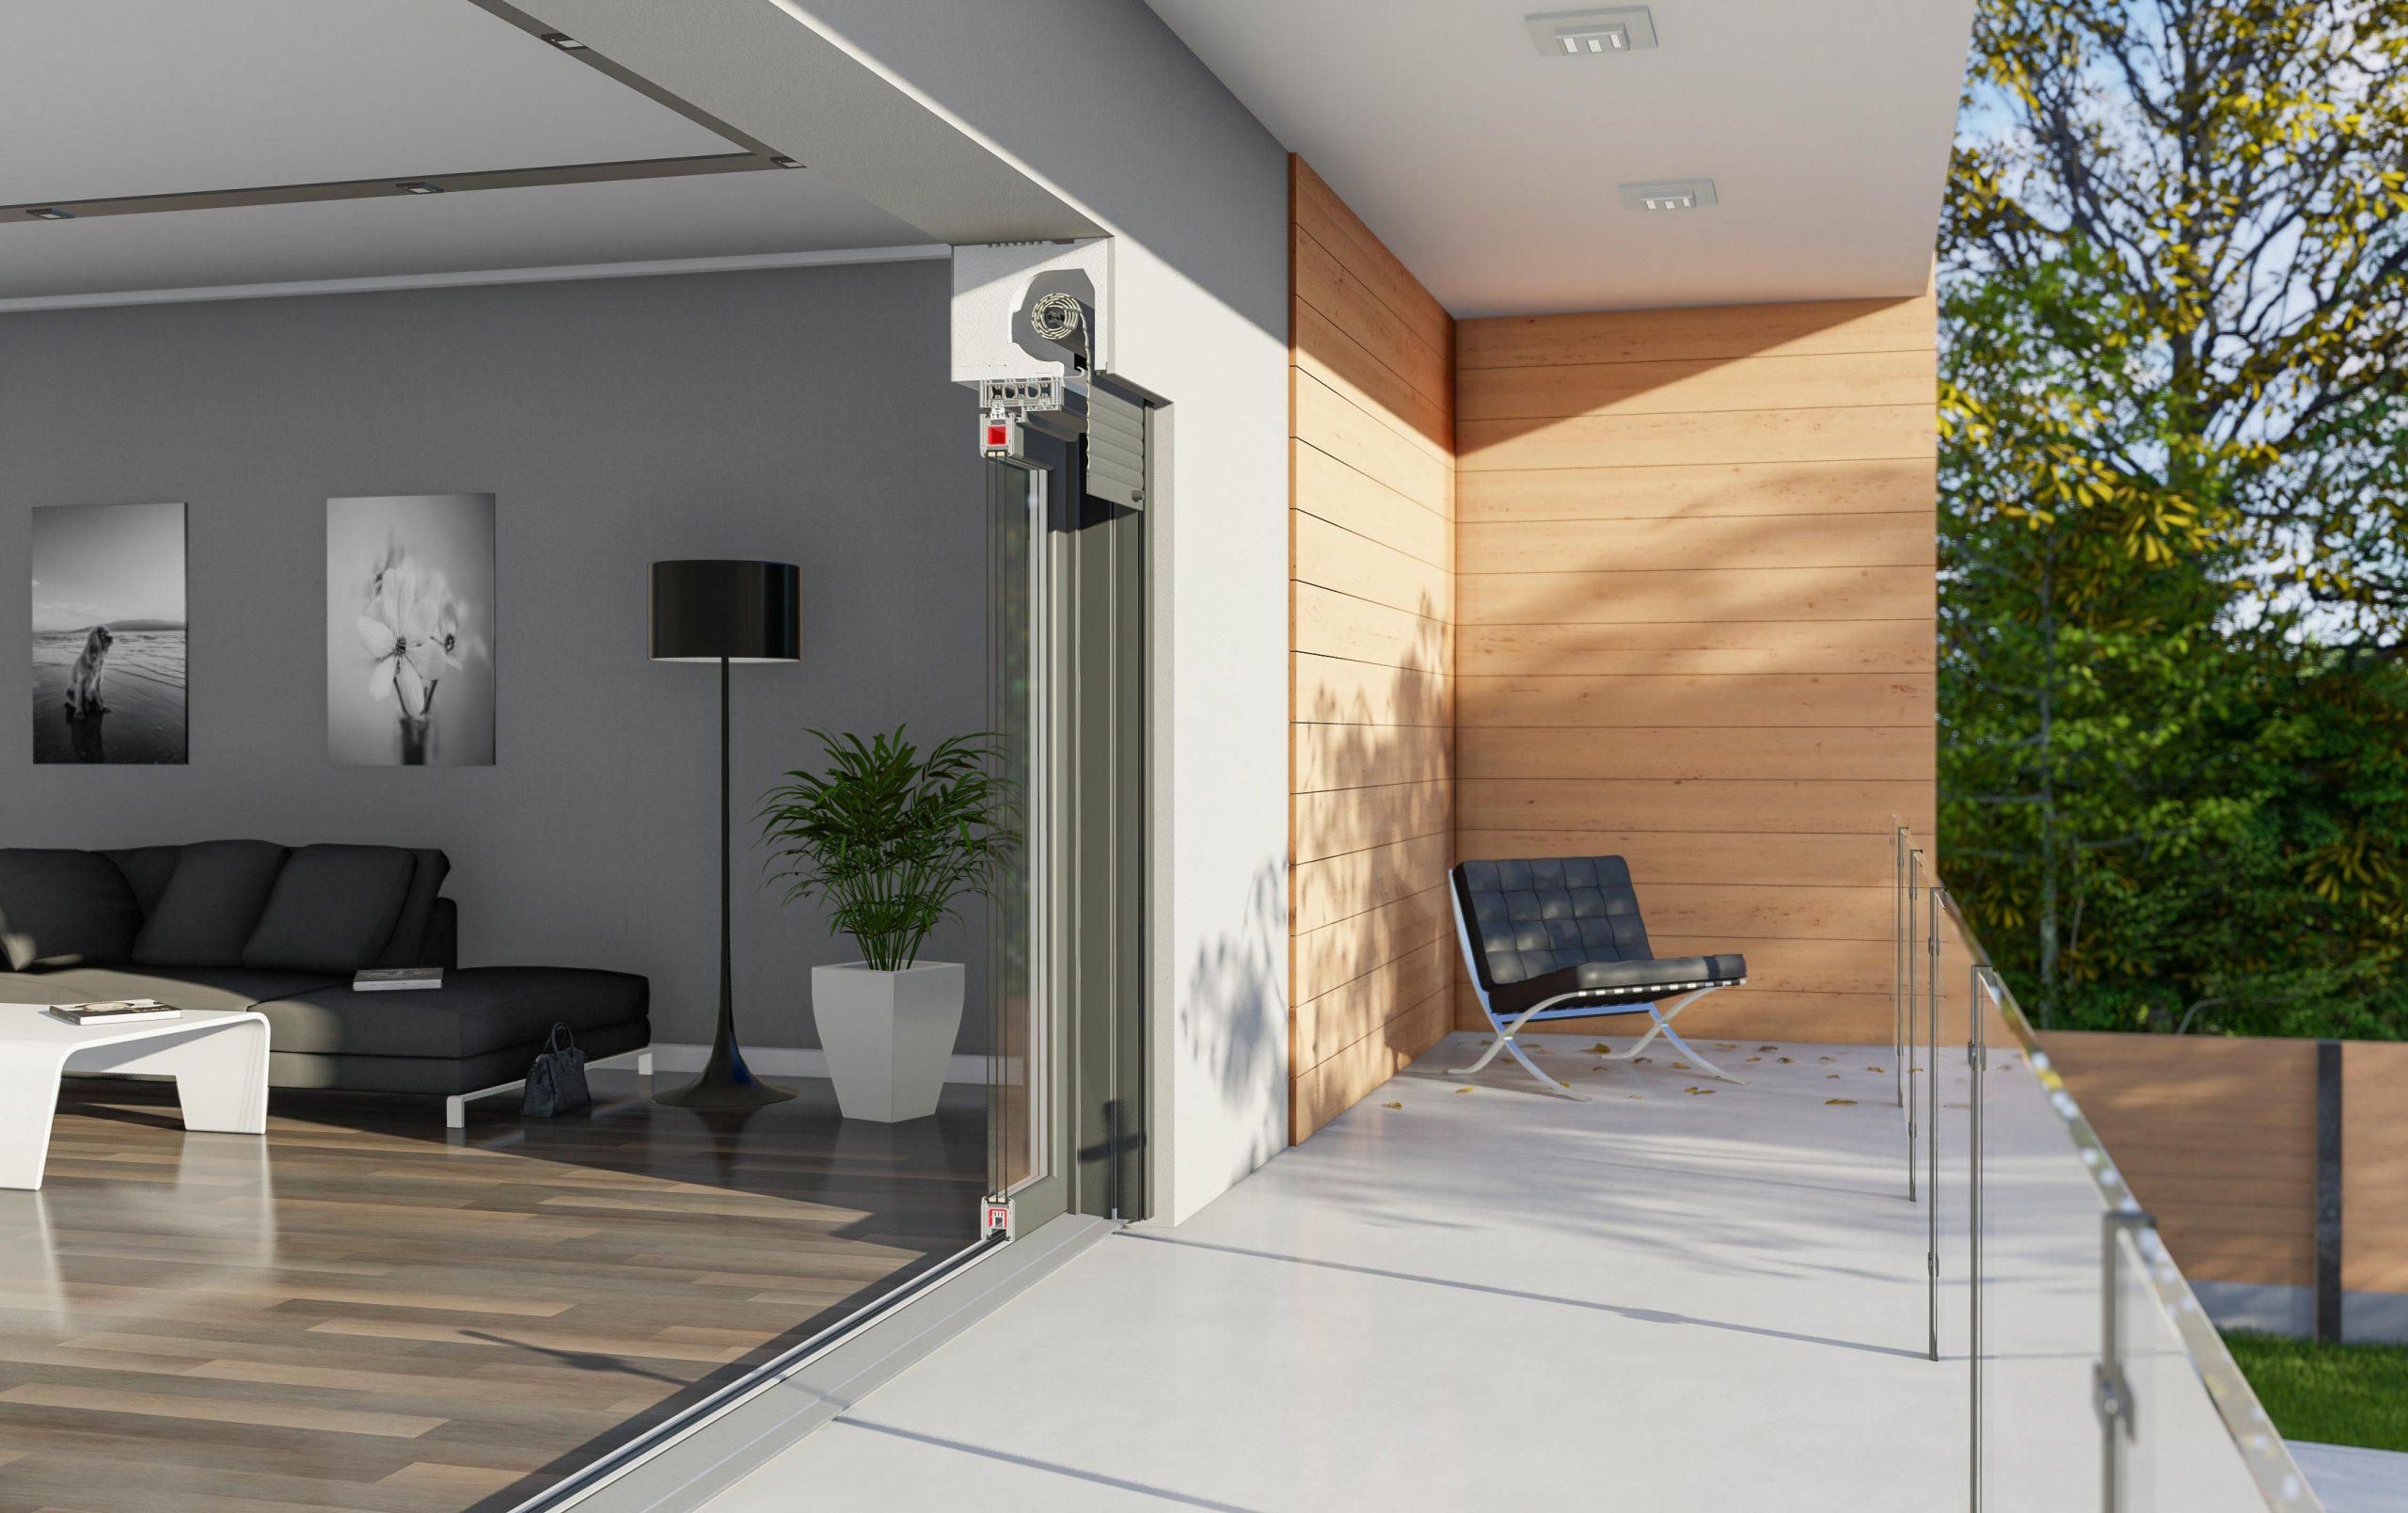 Full Size of Drutex Erfahrungen Forum Drutefenster Holz Alu Bewertungen Bewertung Aus Fenster Test Wohnzimmer Drutex Erfahrungen Forum